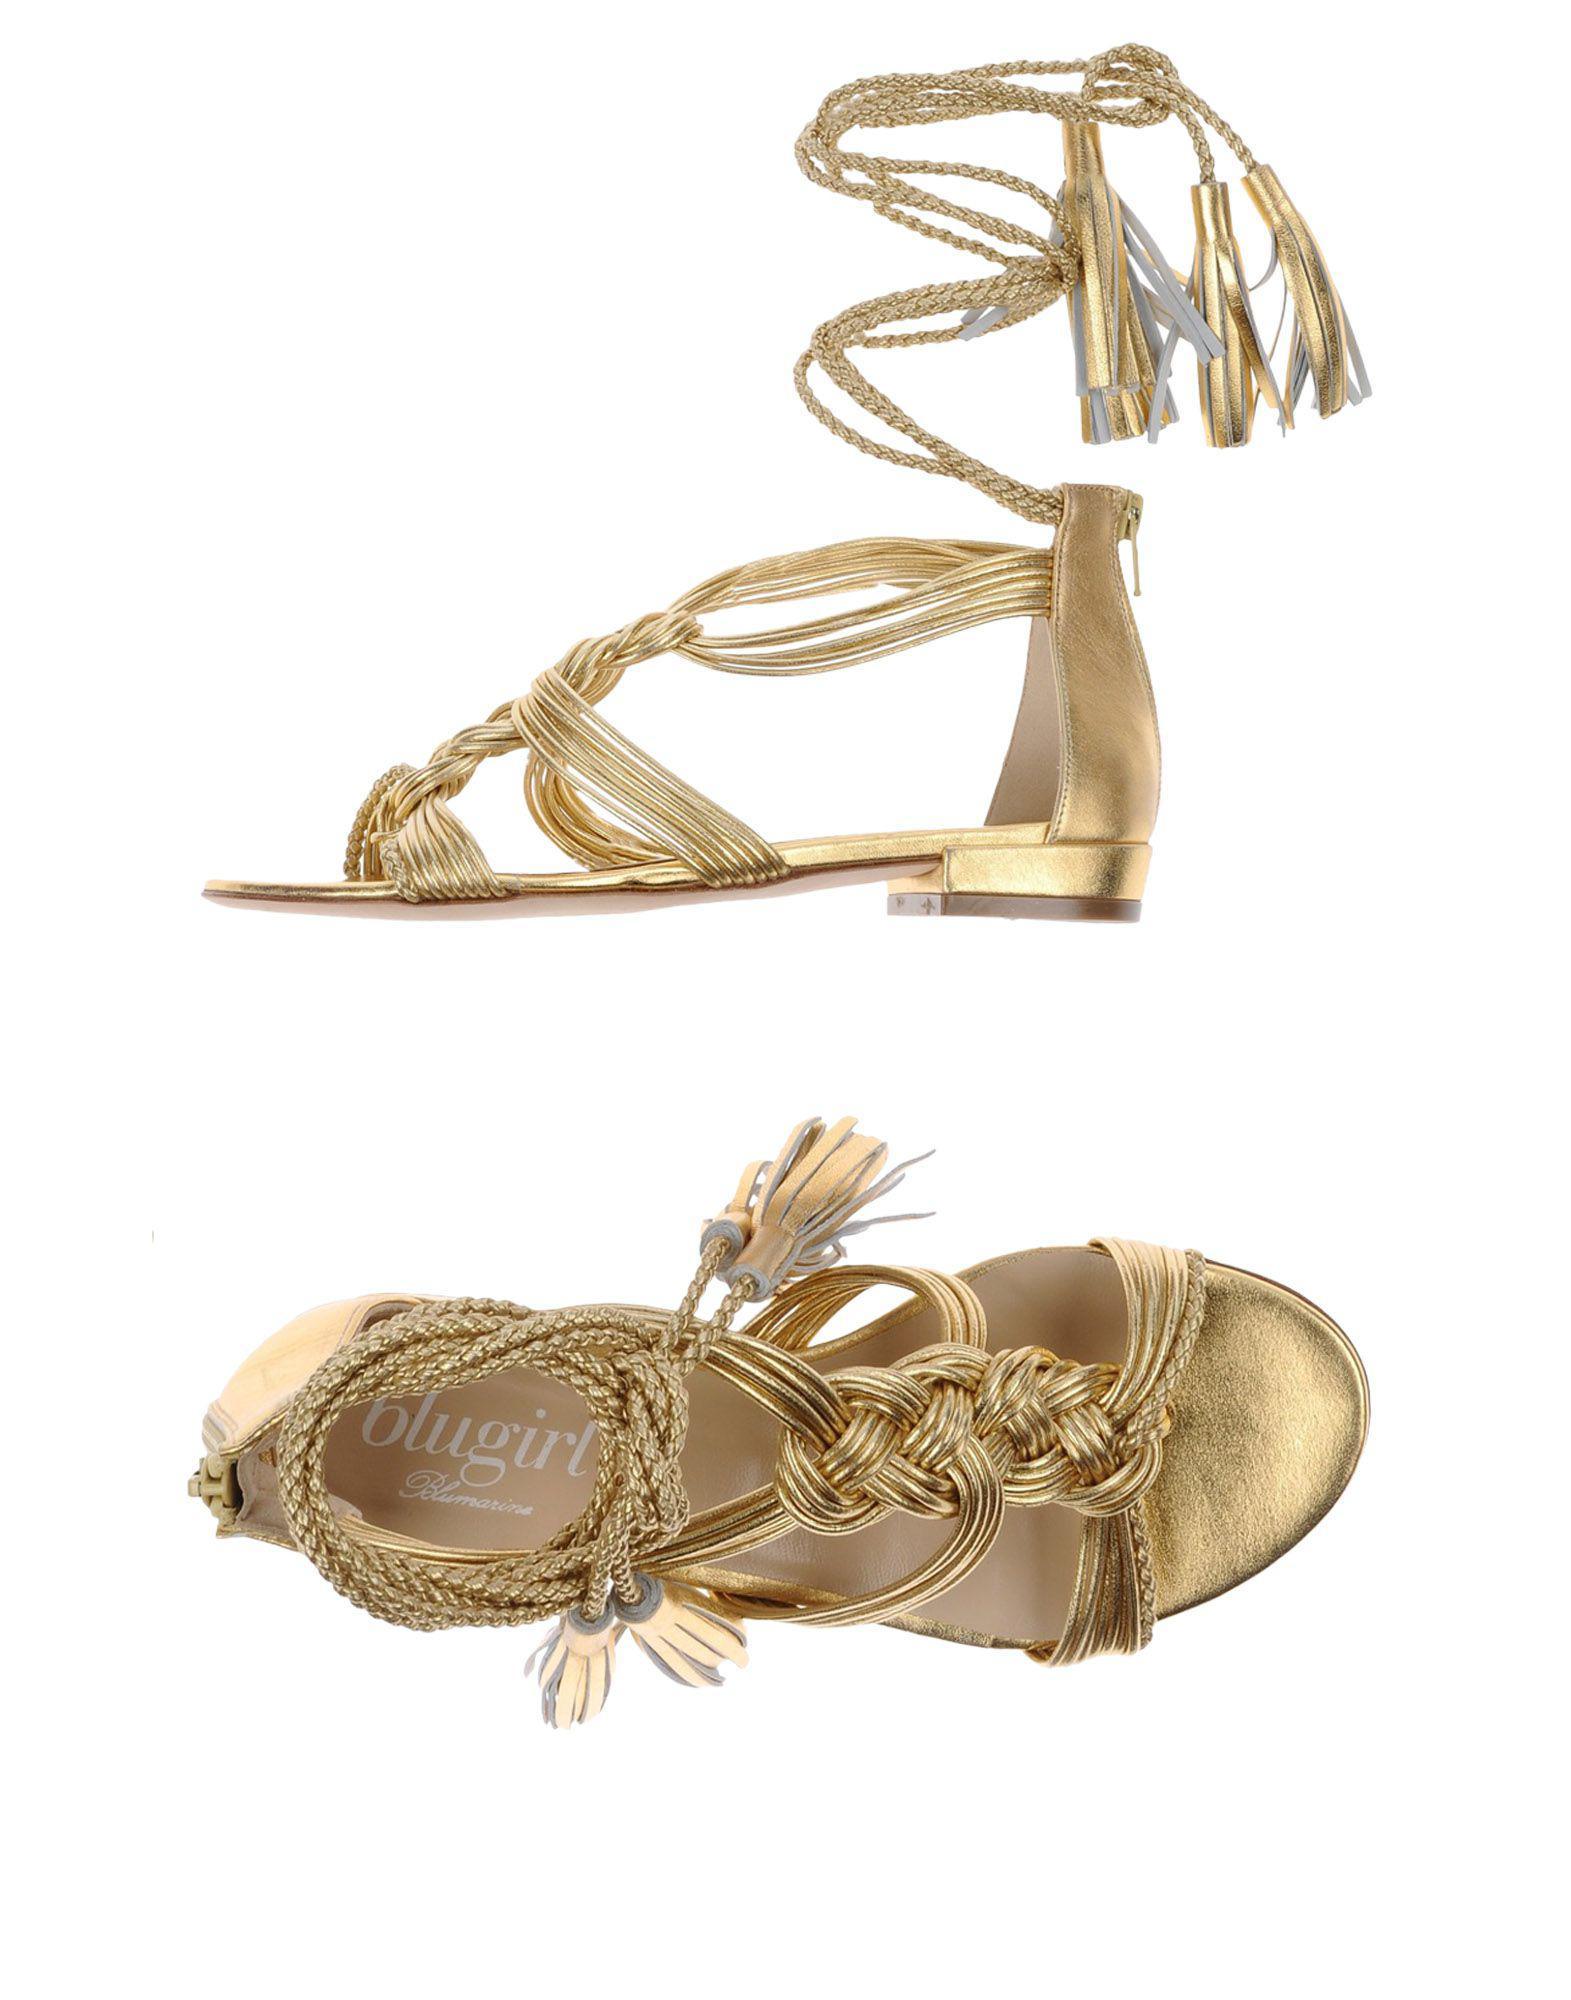 FOOTWEAR - Toe post sandals Blugirl Limited MZCOYp